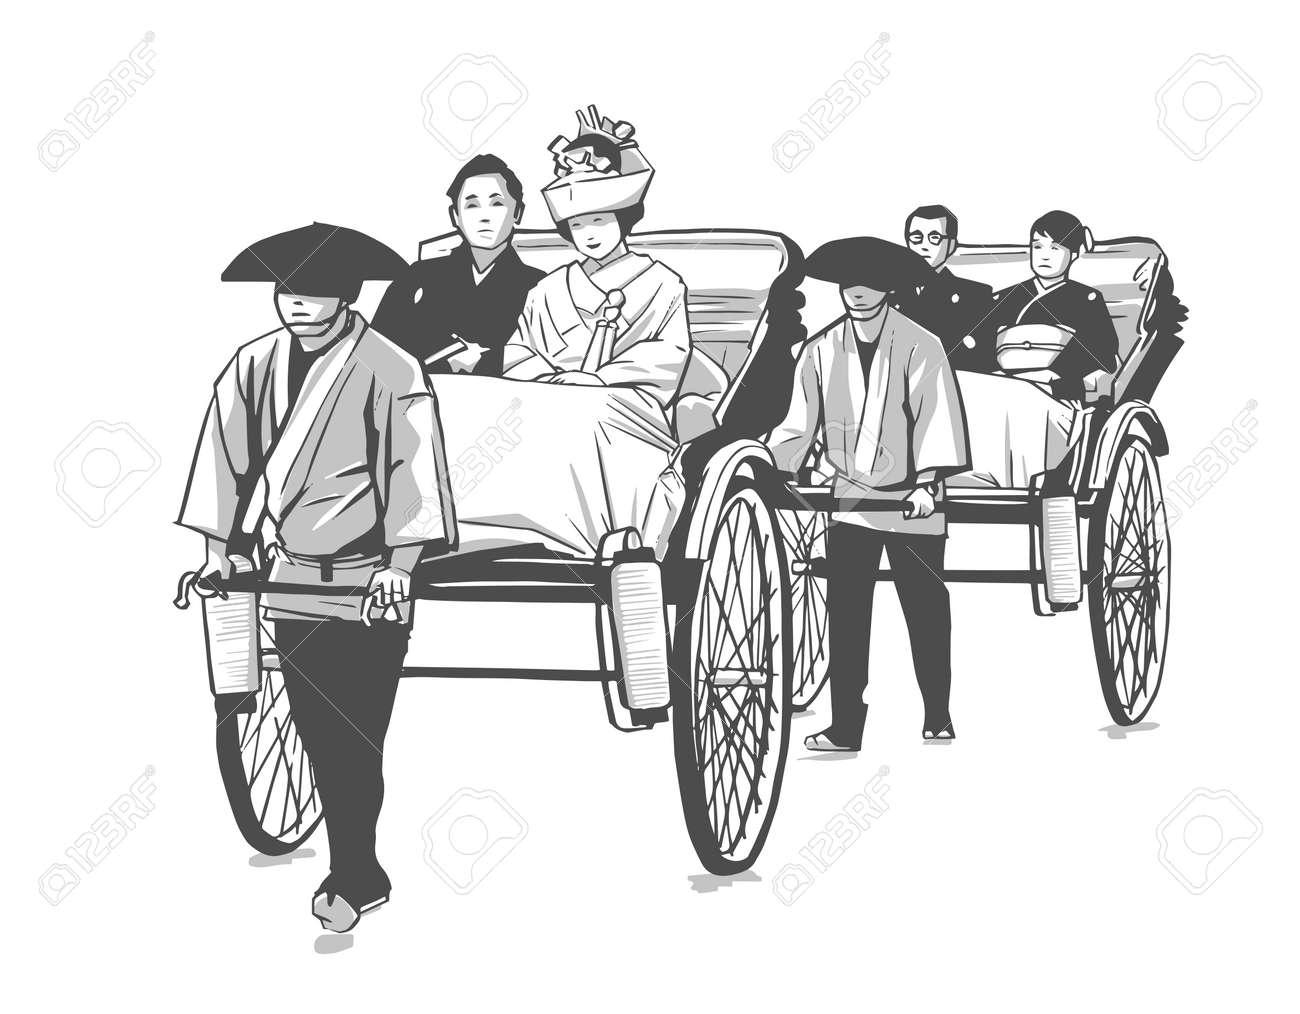 Illustration of traditional Japanese wedding, pulled rickshaw, groom and bride - 127290630